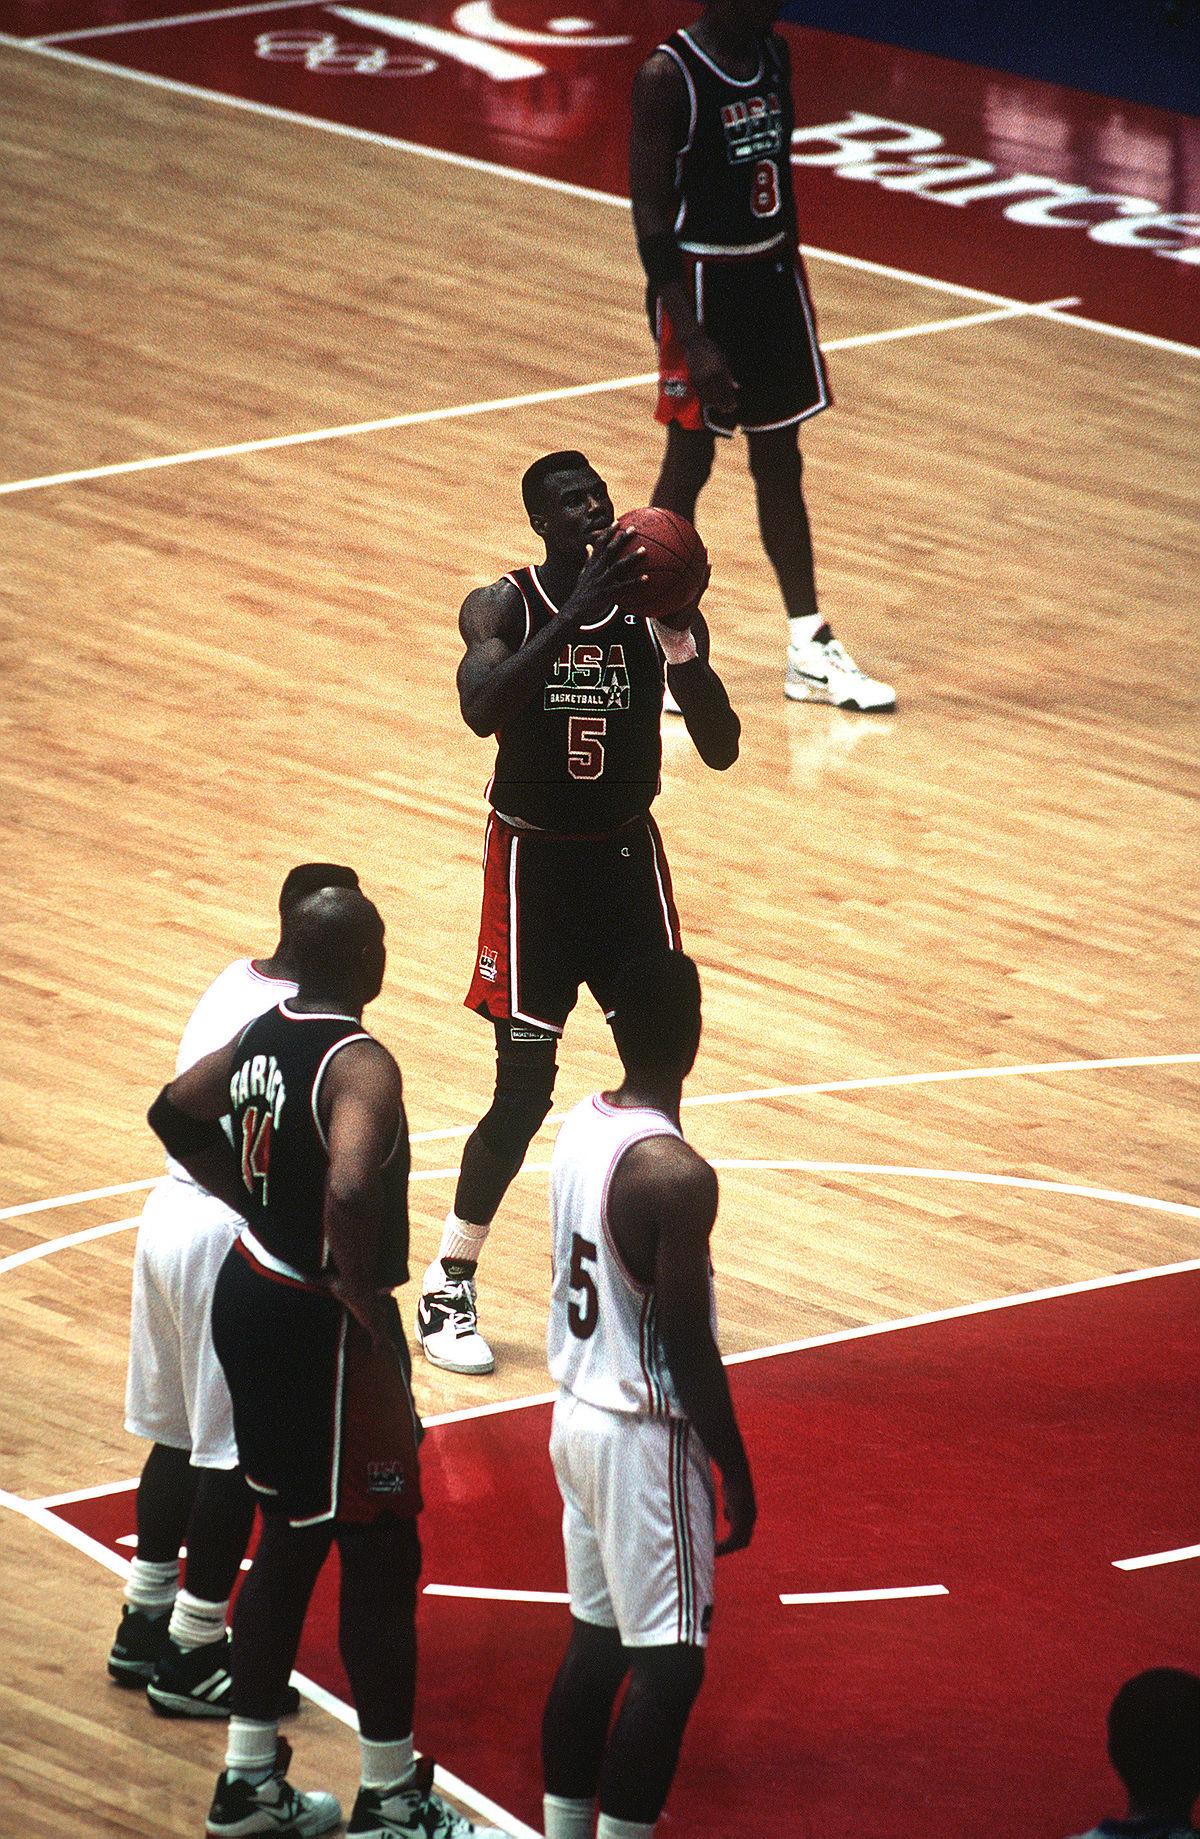 Team: 1992 United States Men's Olympic Basketball Team